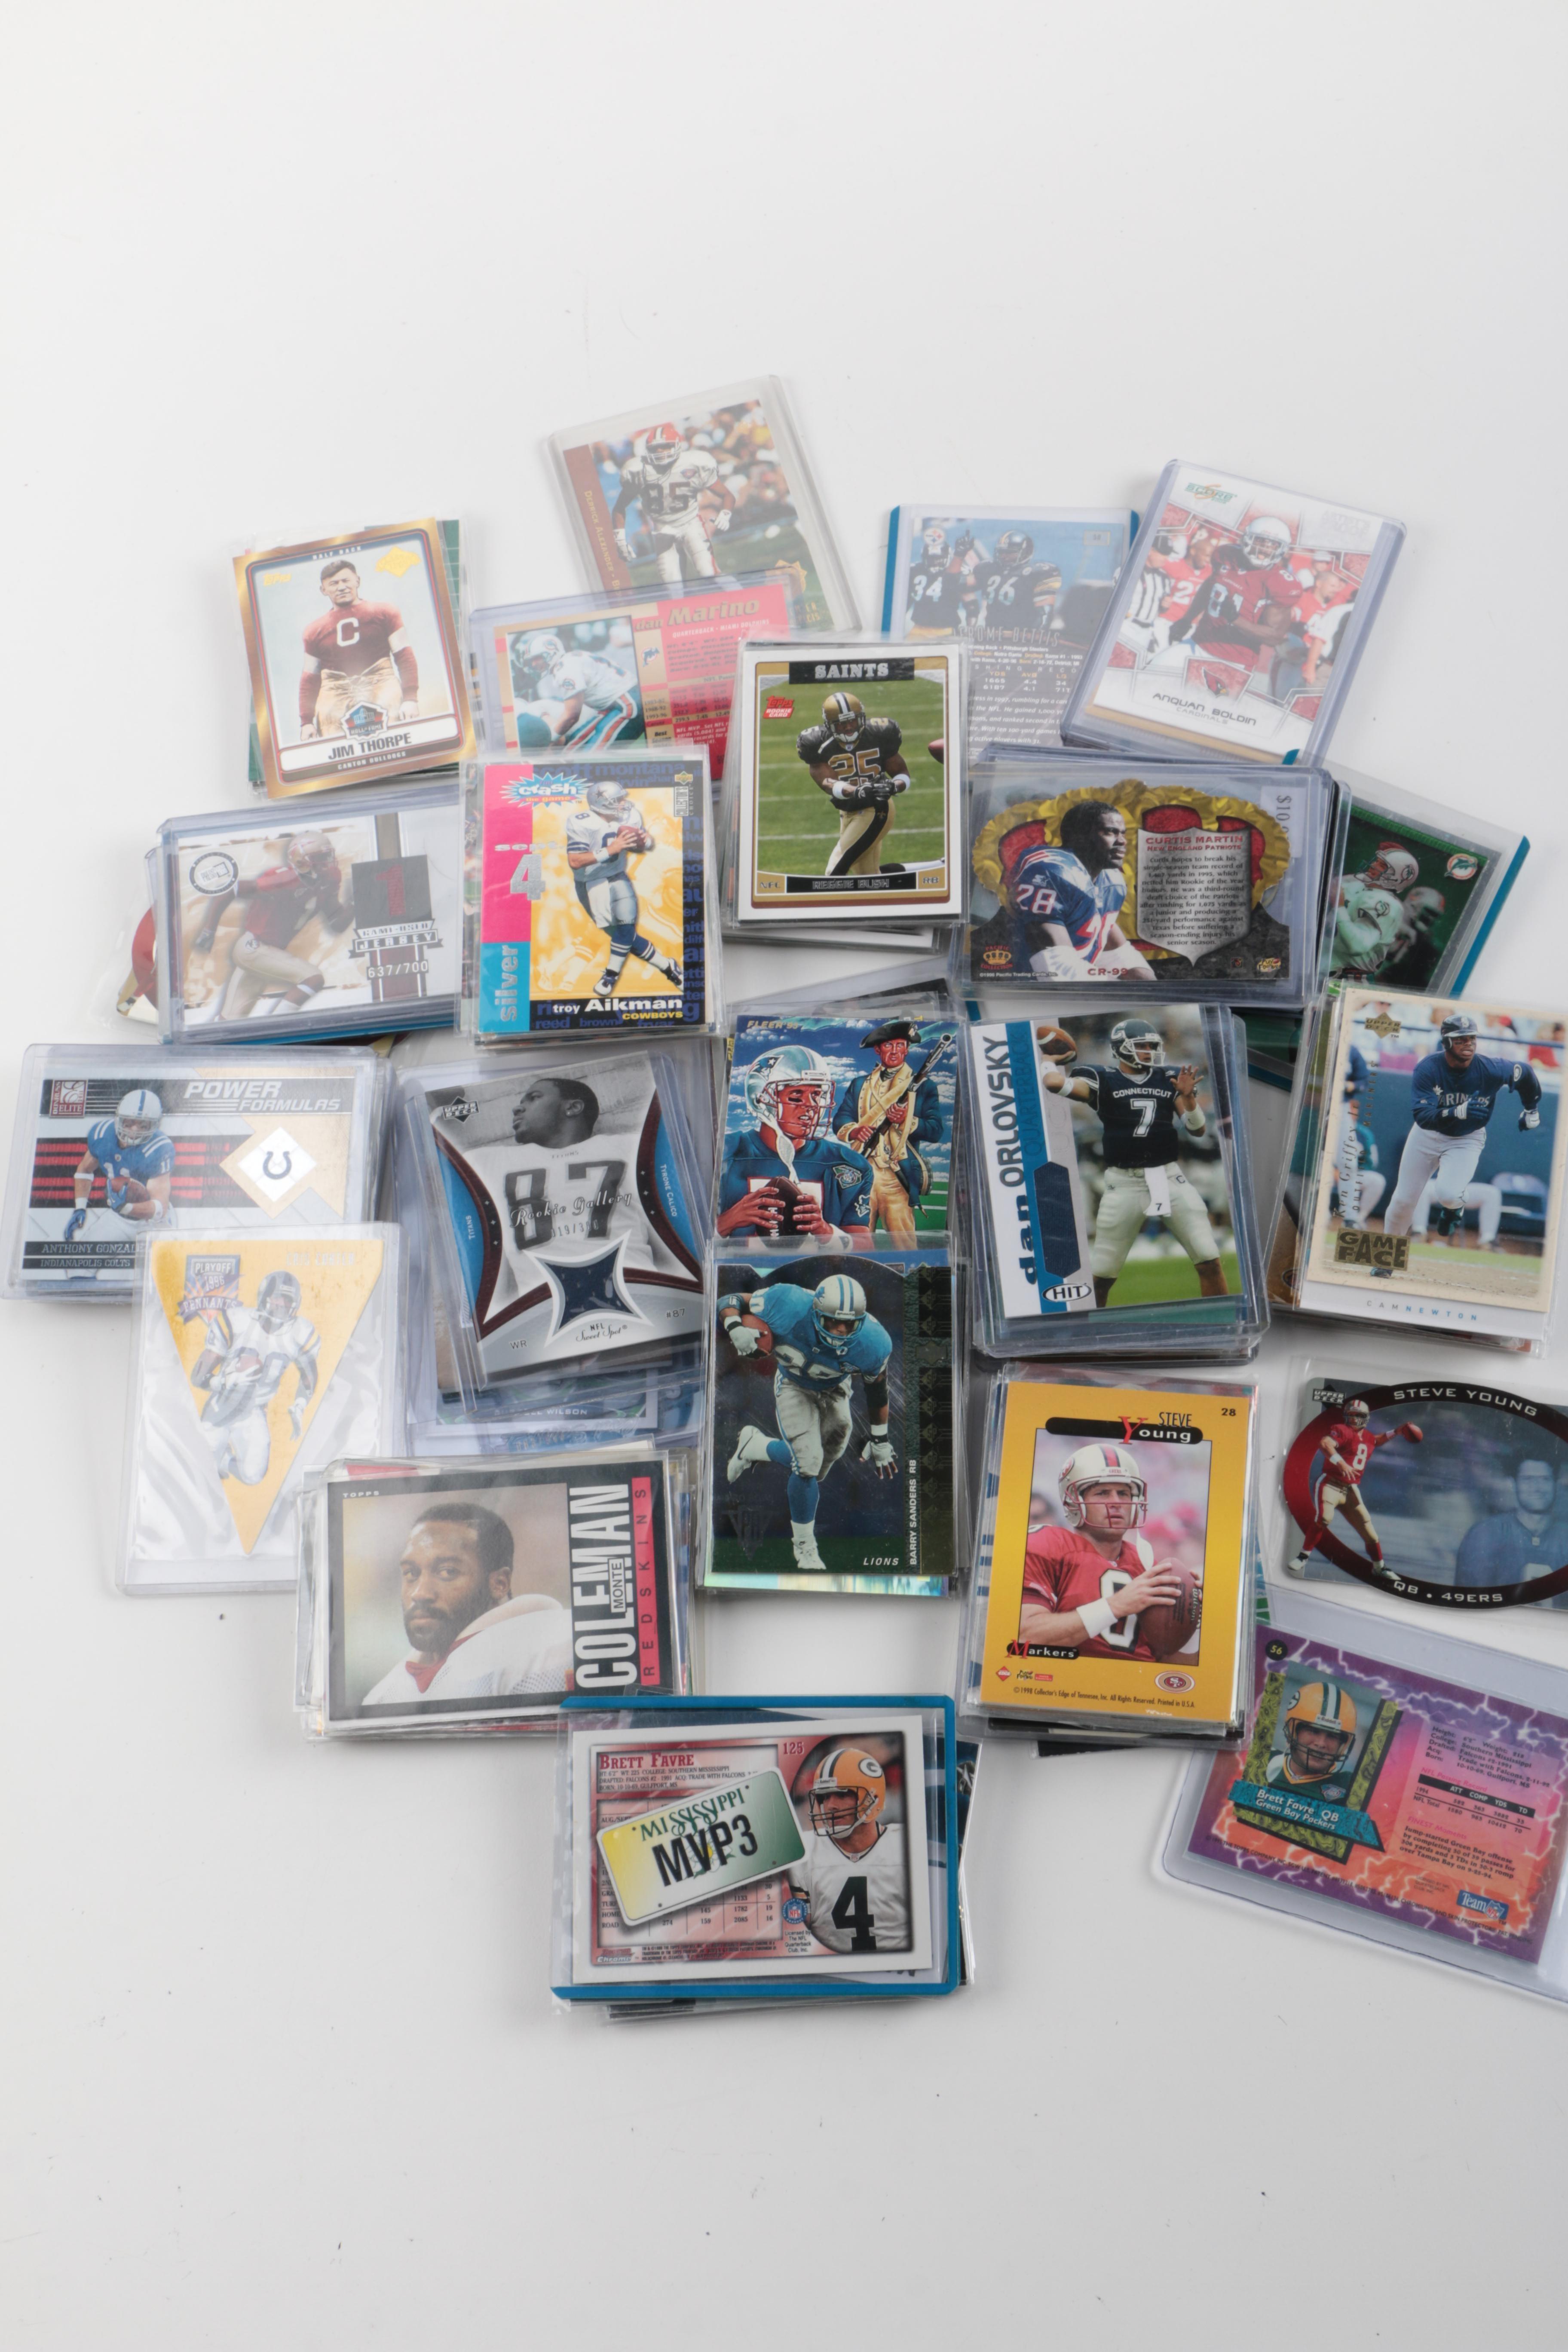 Assortment of 21st Century Football Cards